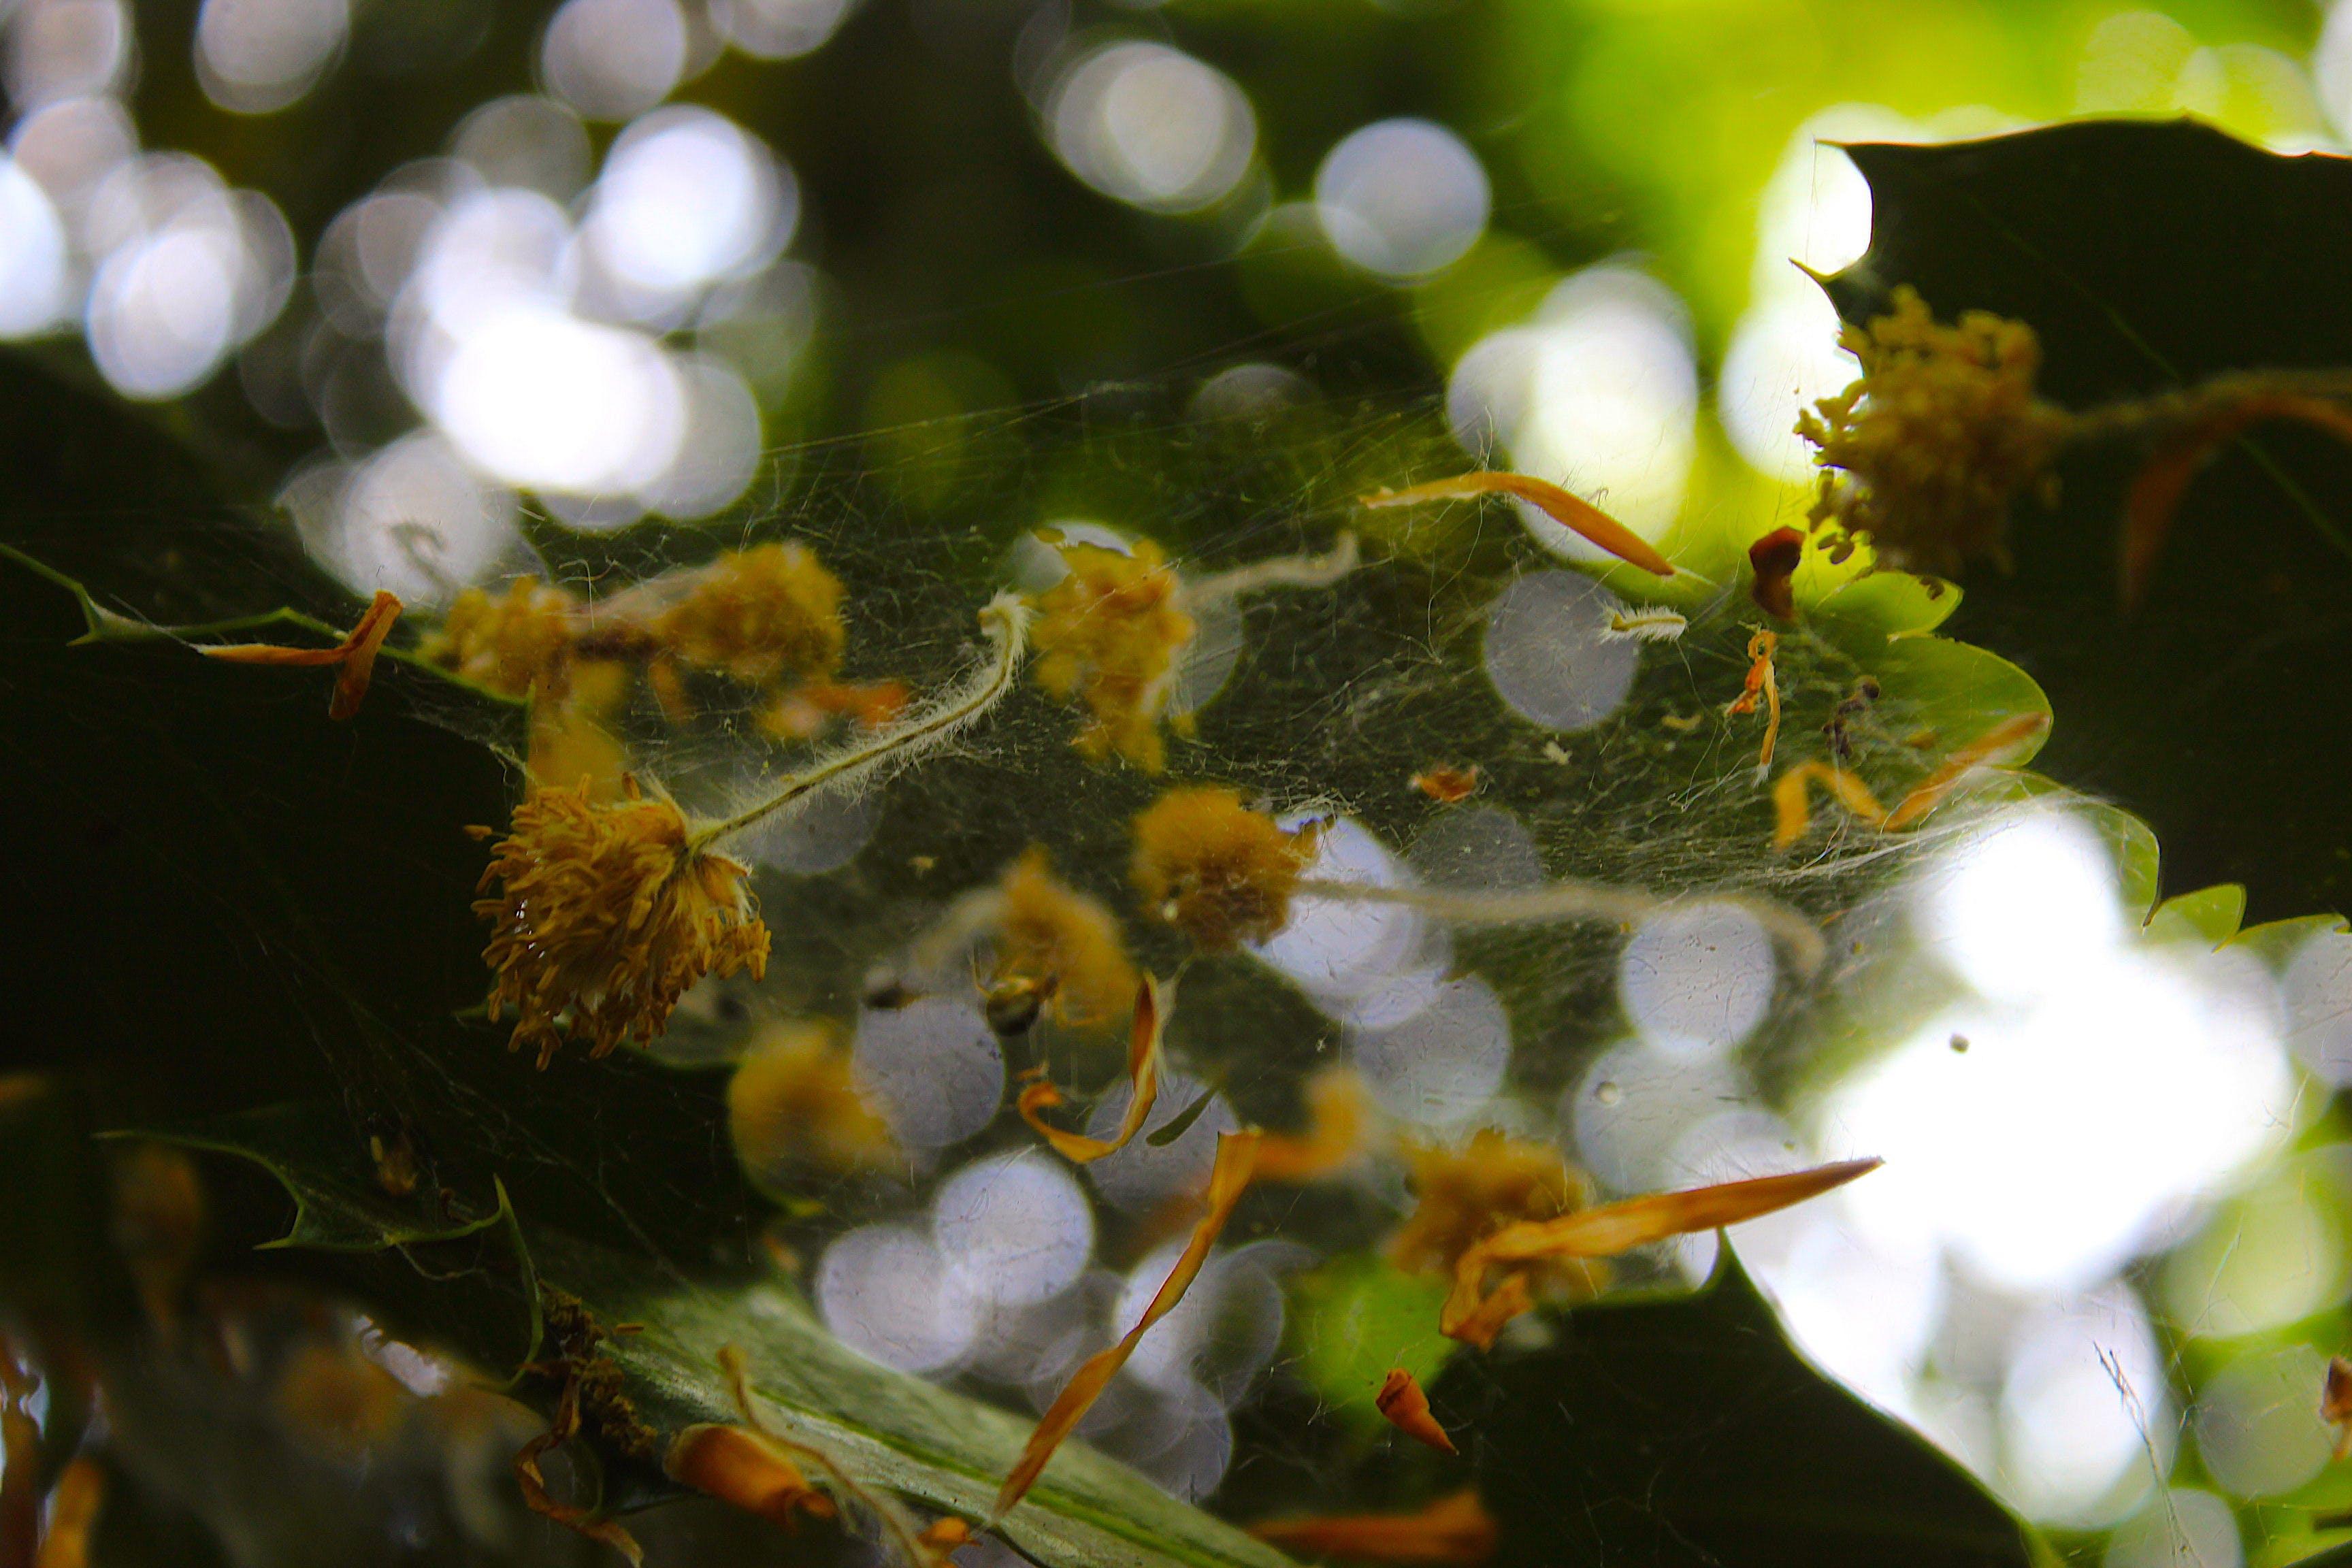 Flowers On Spiderweb